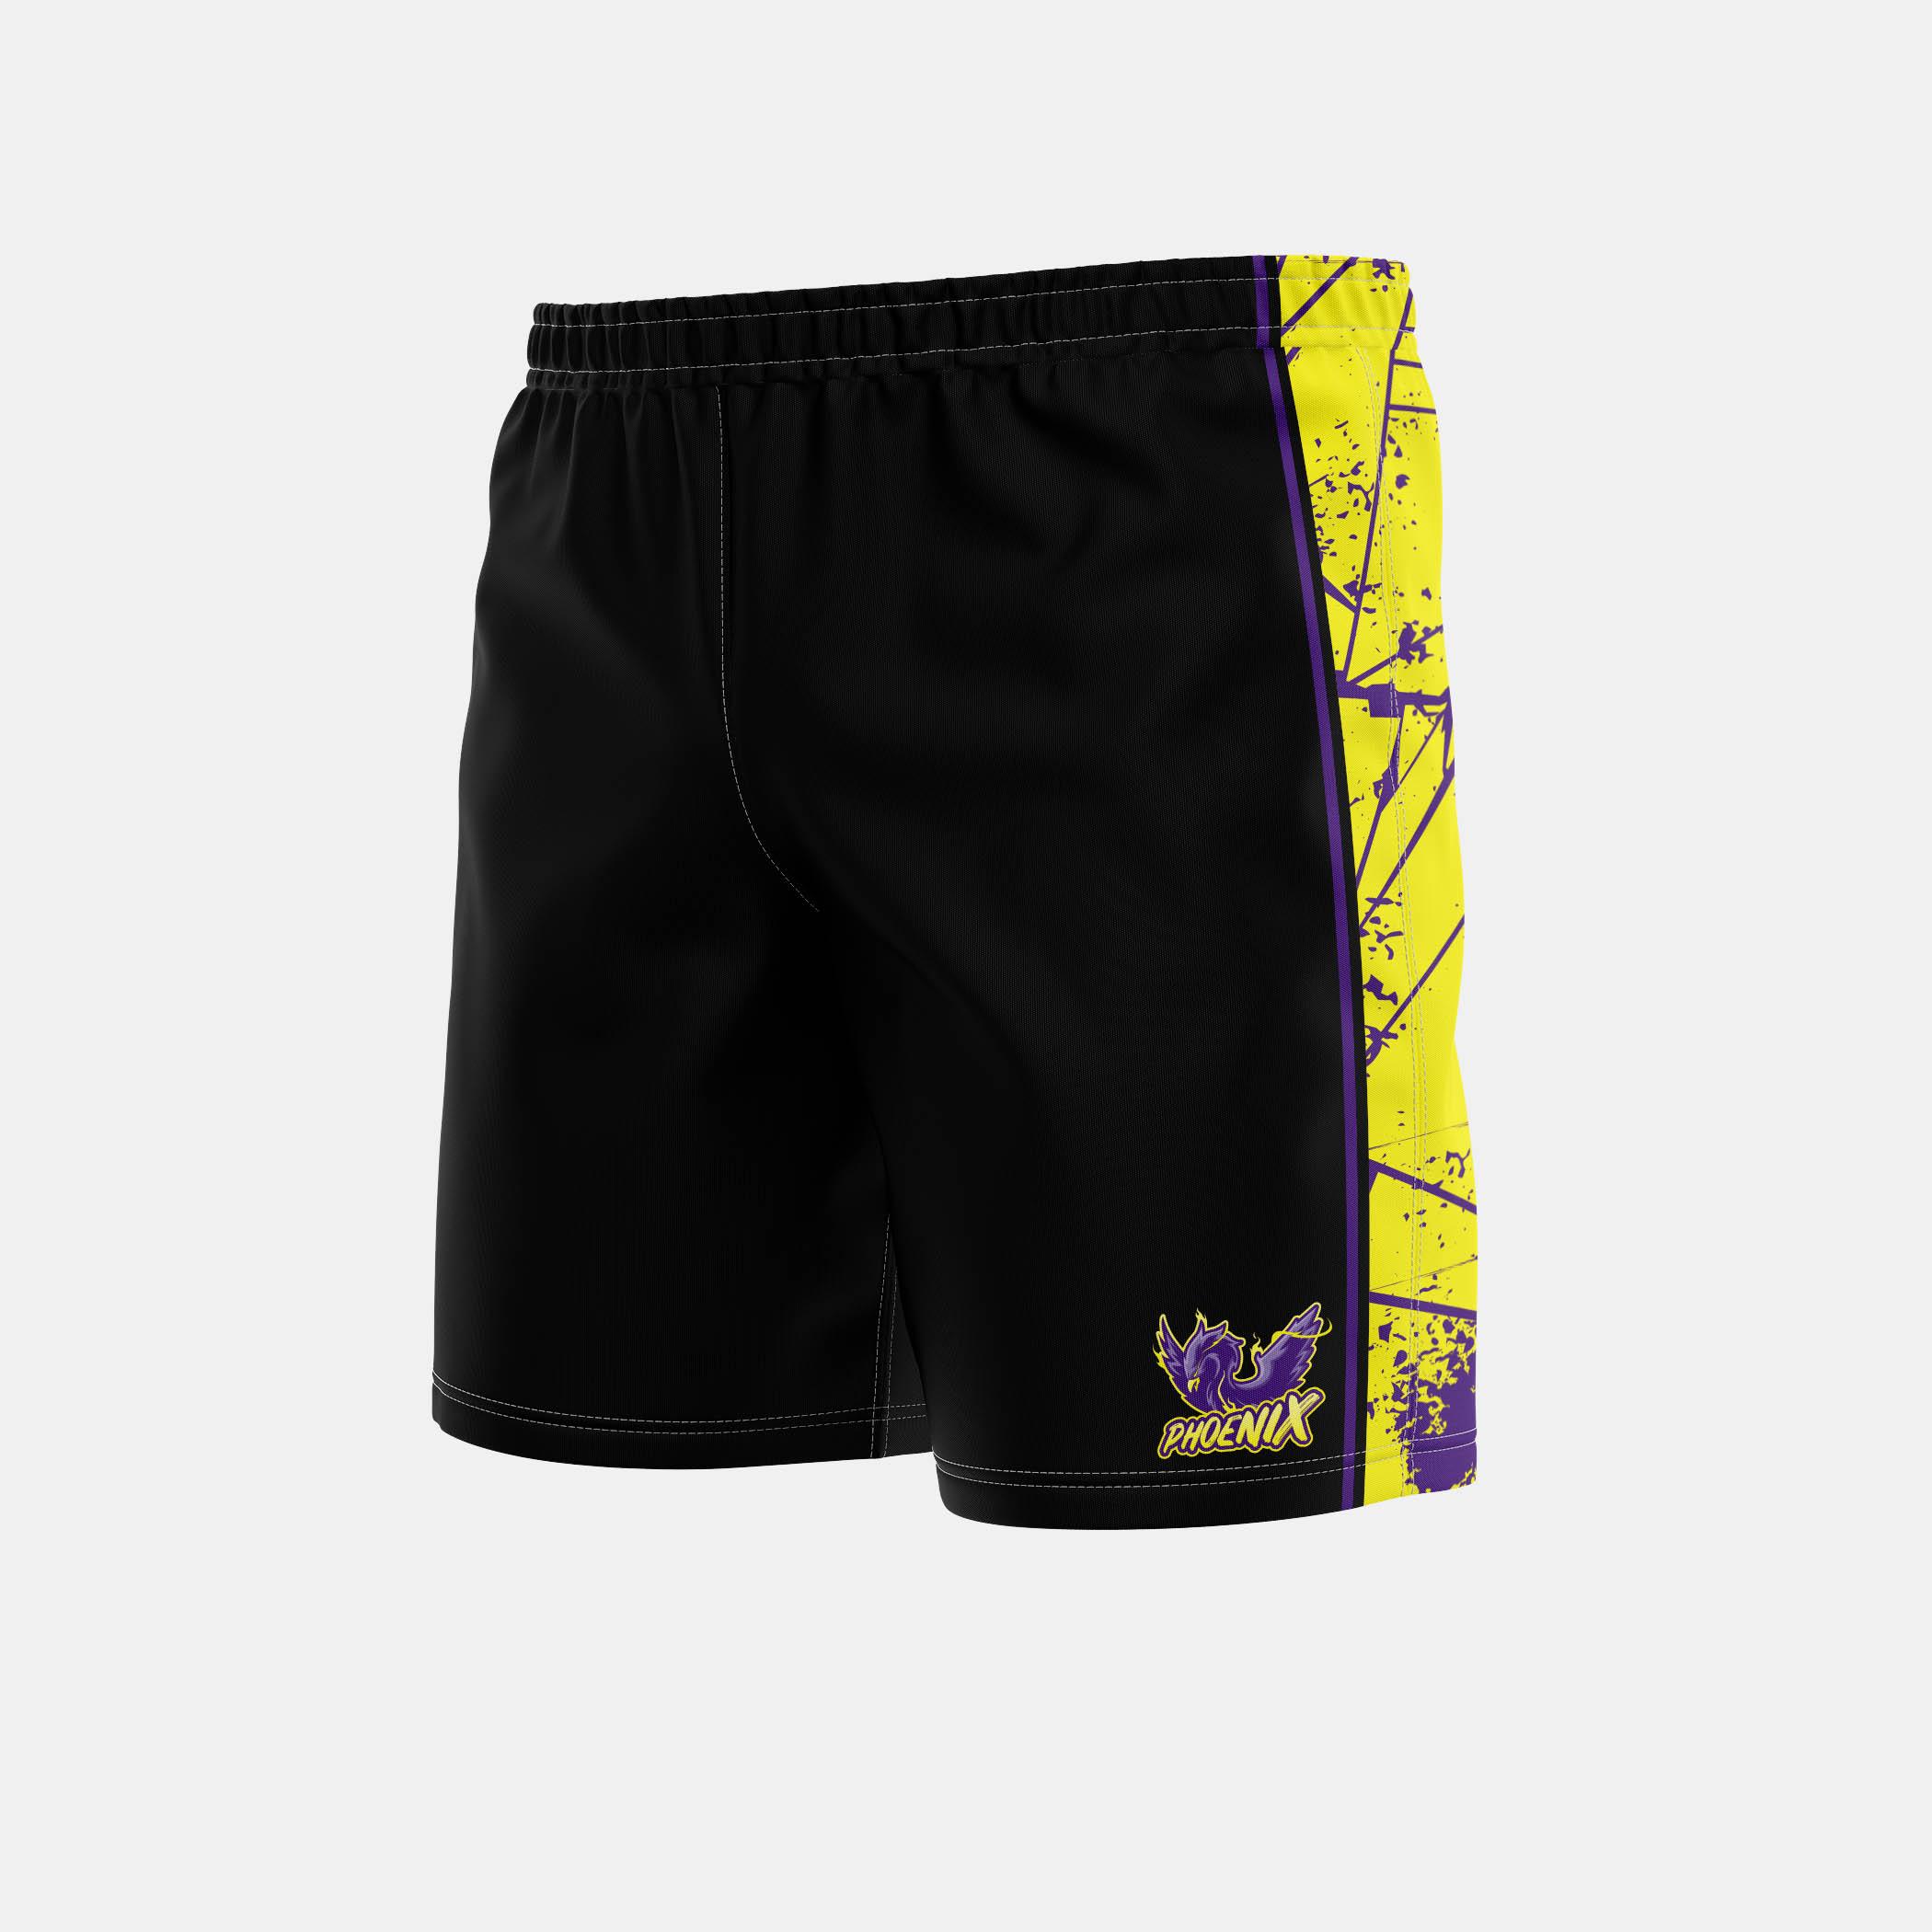 Phoenix VB Shorts 3 4 L View edited